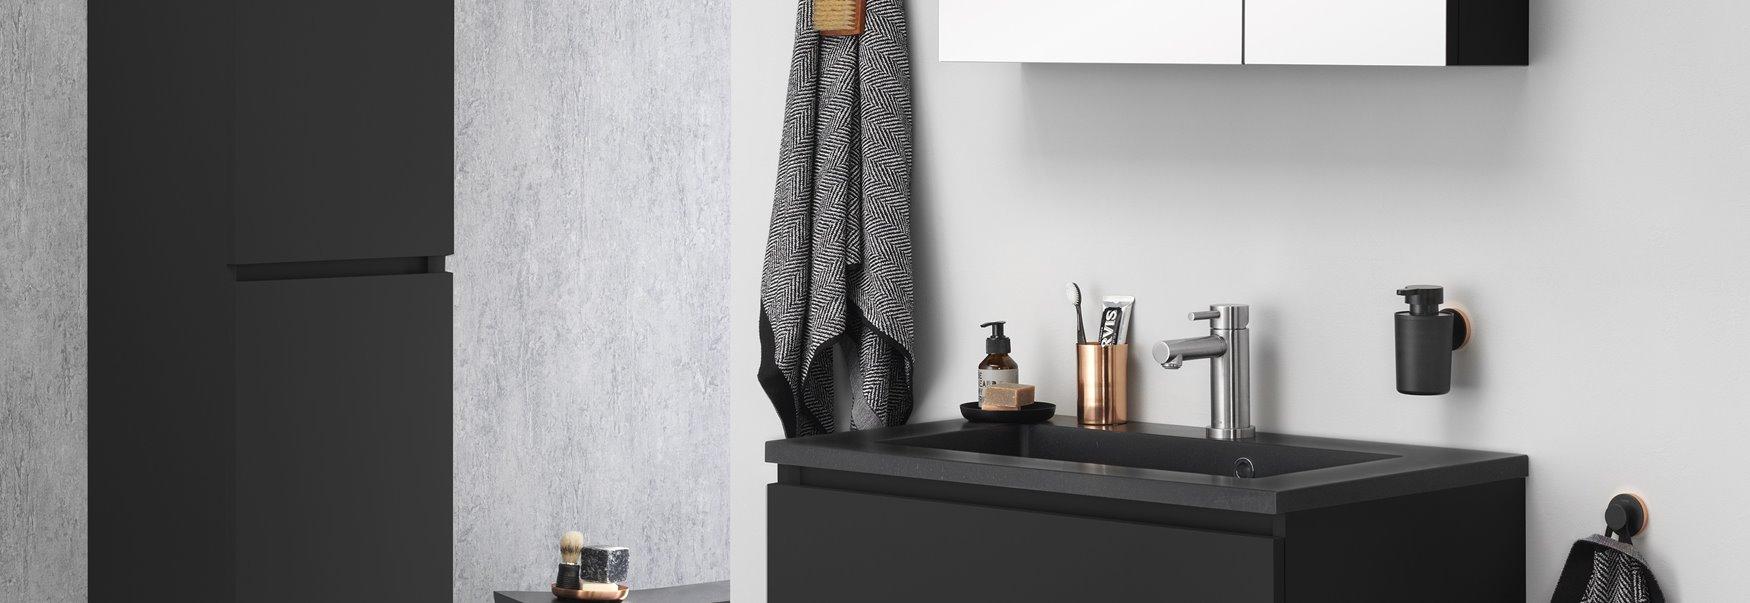 meuble de salle de bains loft noir mat